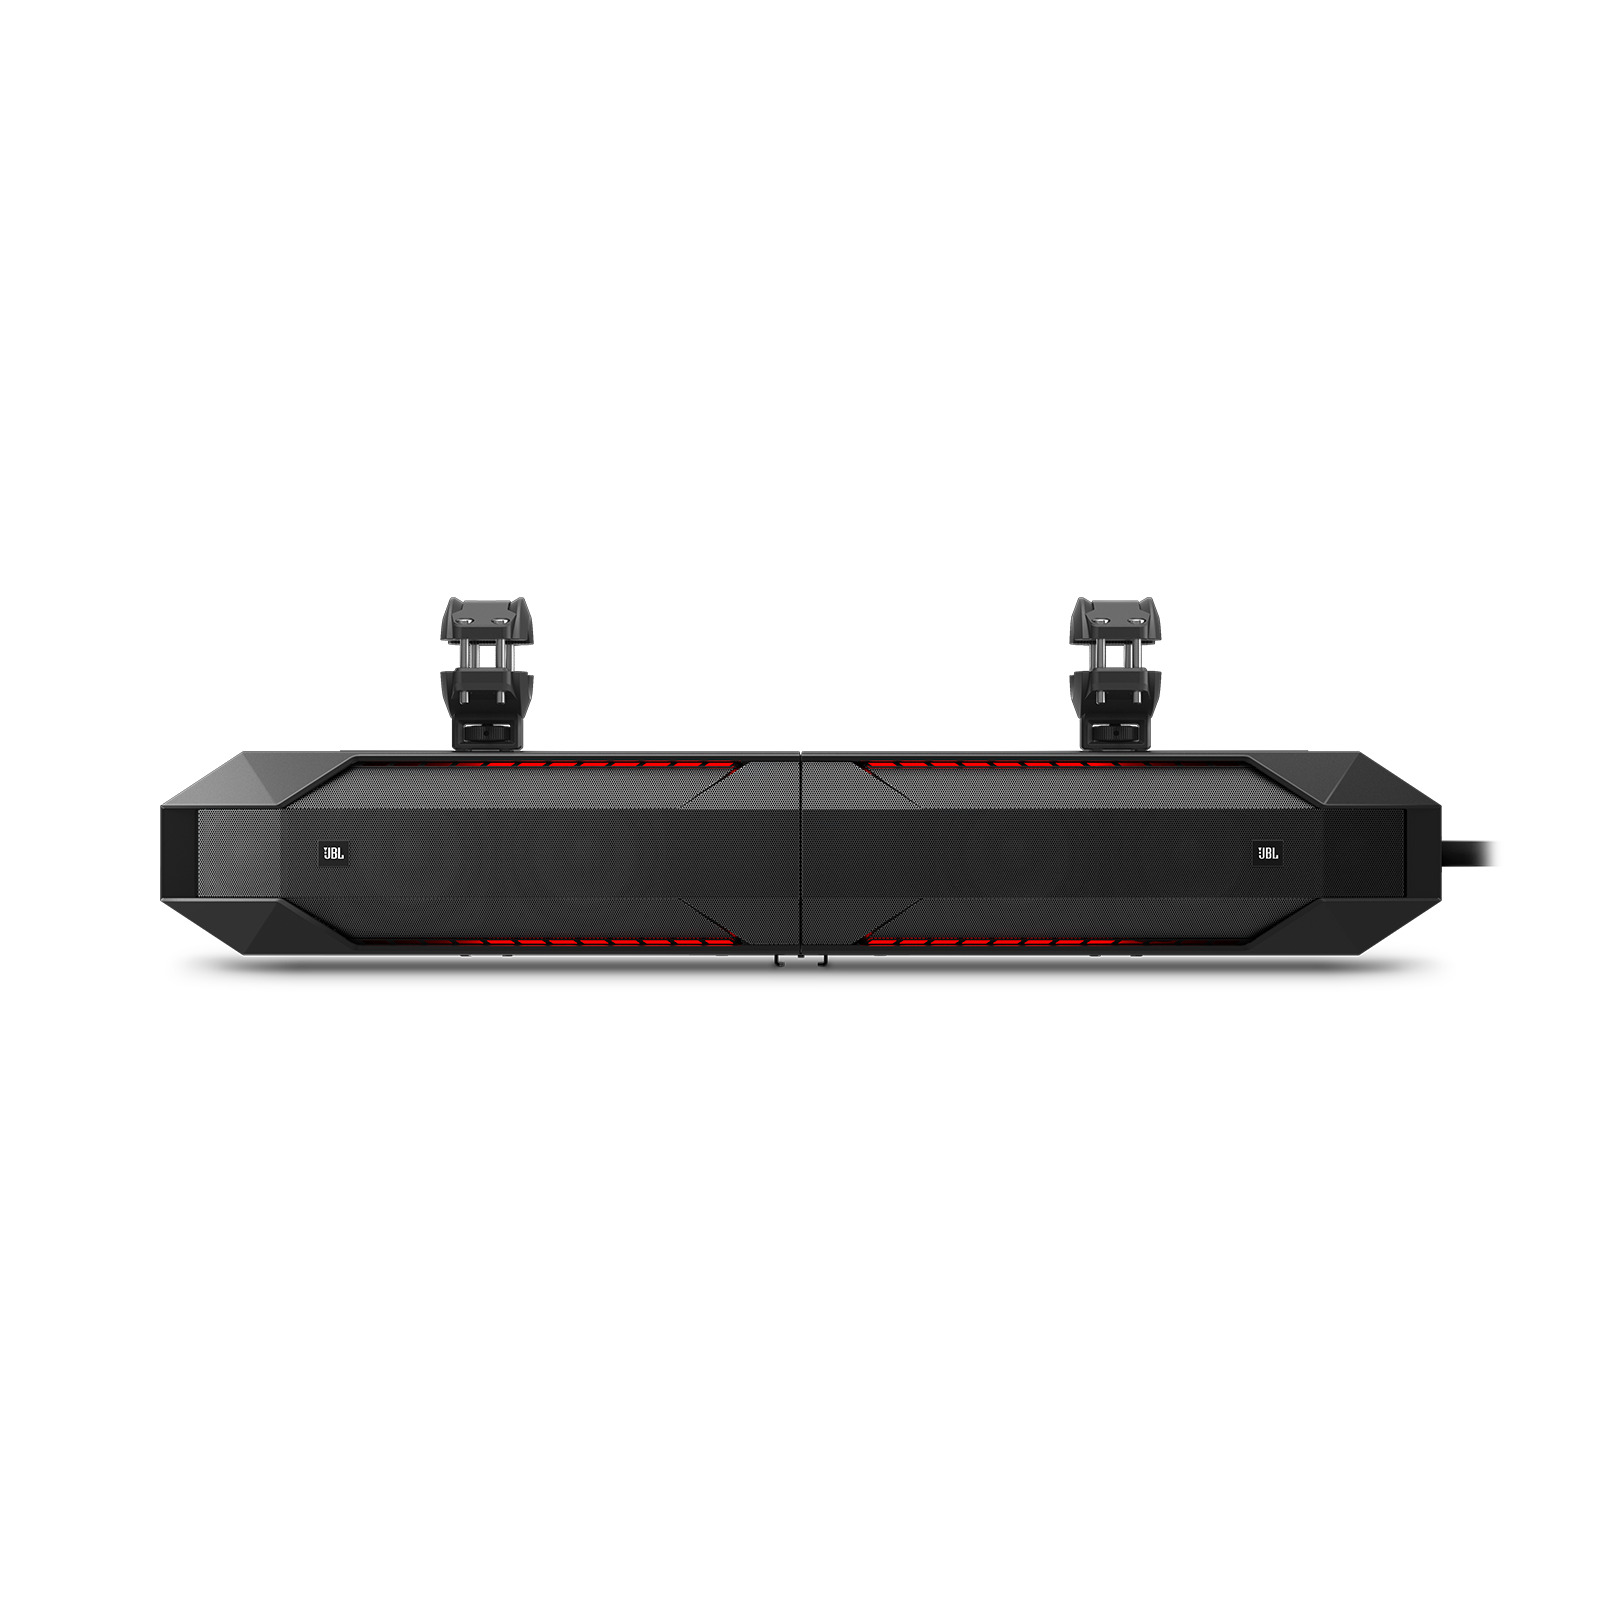 JBL Stadium UB4100 Powersports - Black - Weatherproof Full Range Speaker Pair, 240W - Front